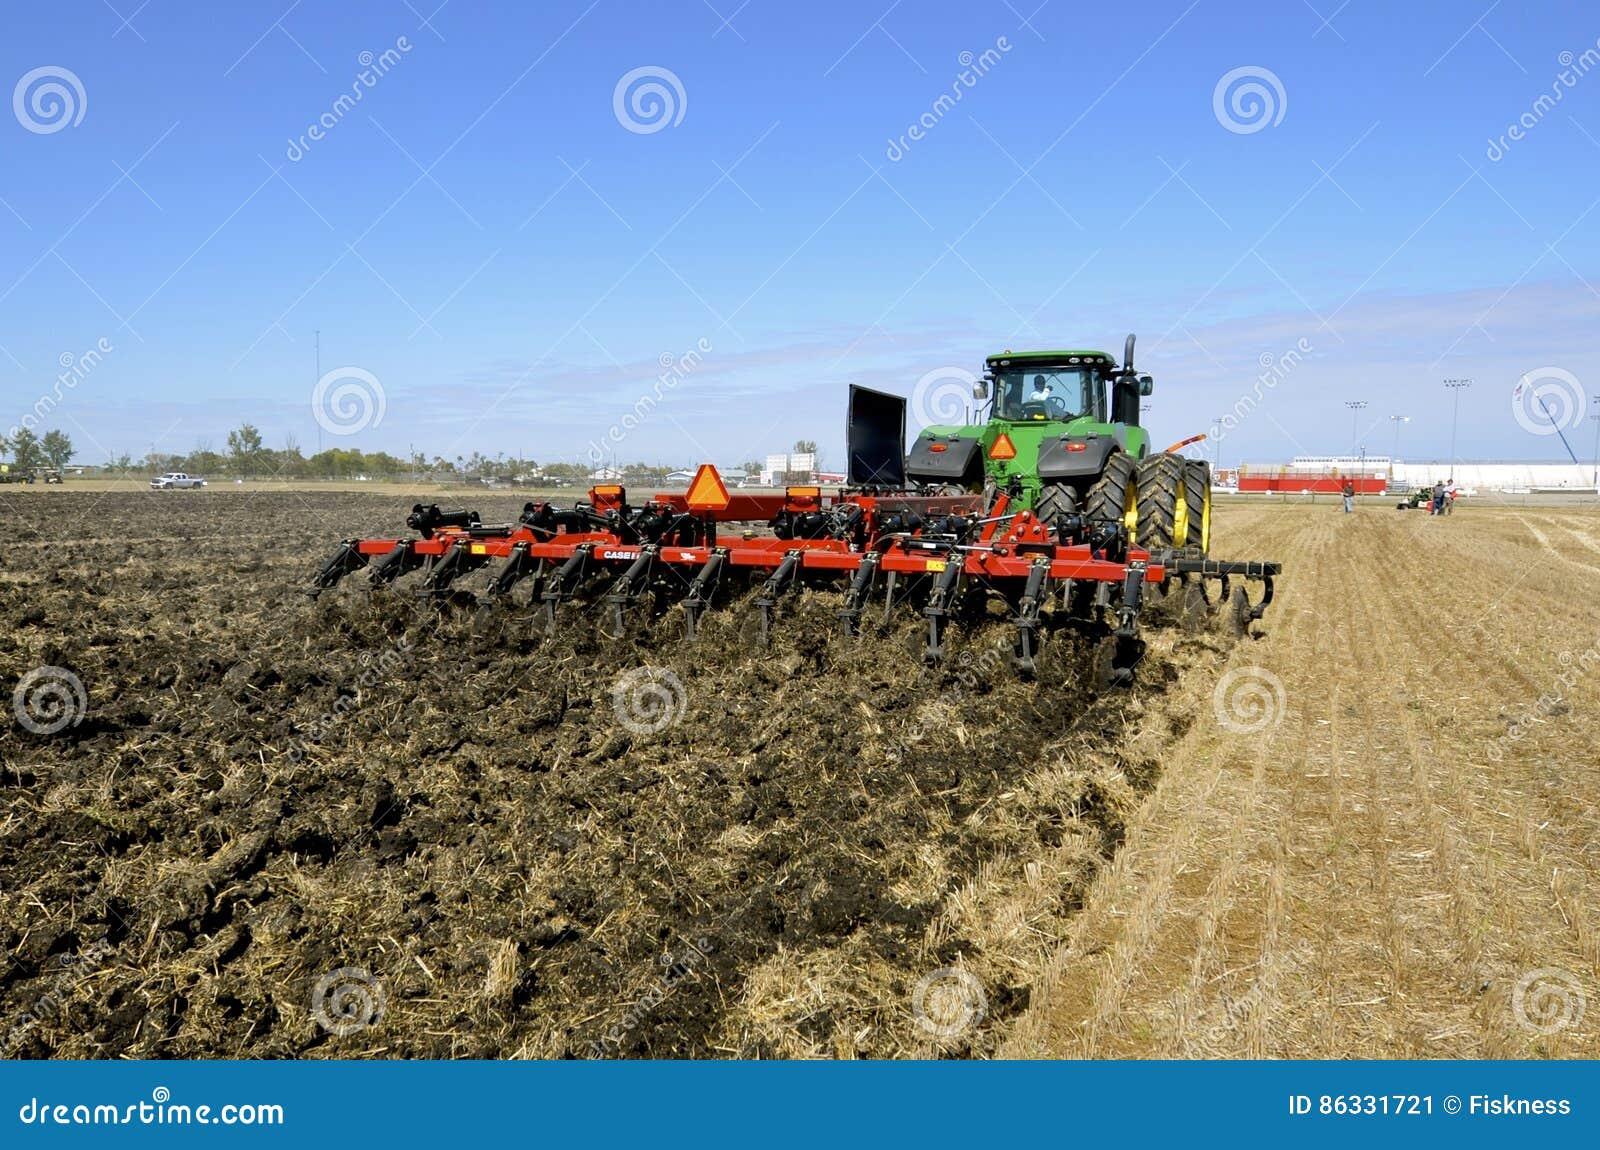 Case IH chisel plow and John Deere tractor